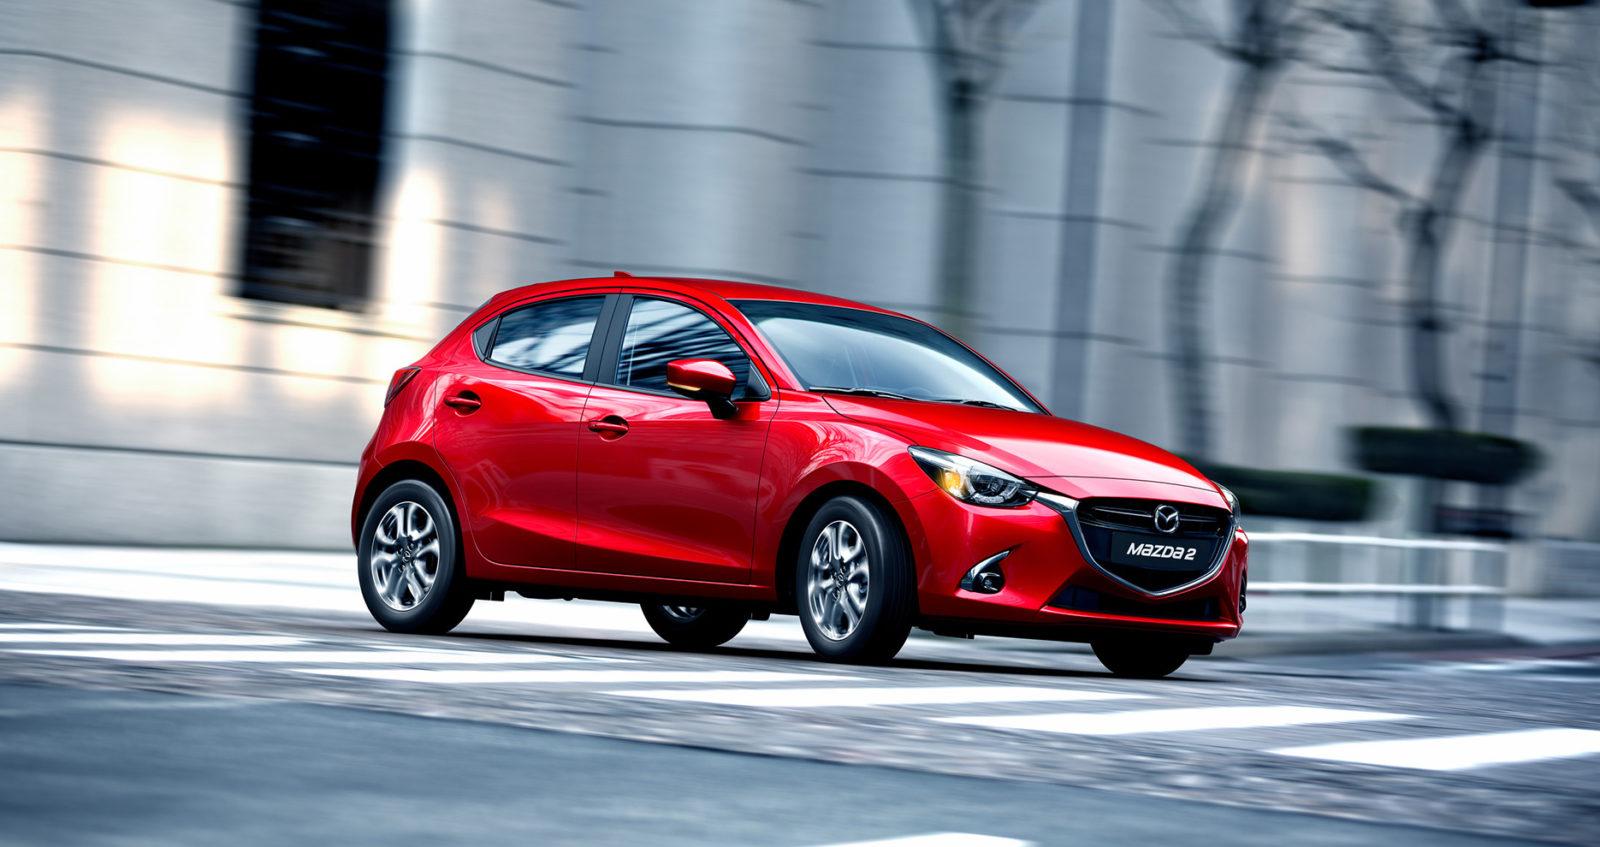 Kelebihan Mazda Cx2 Top Model Tahun Ini